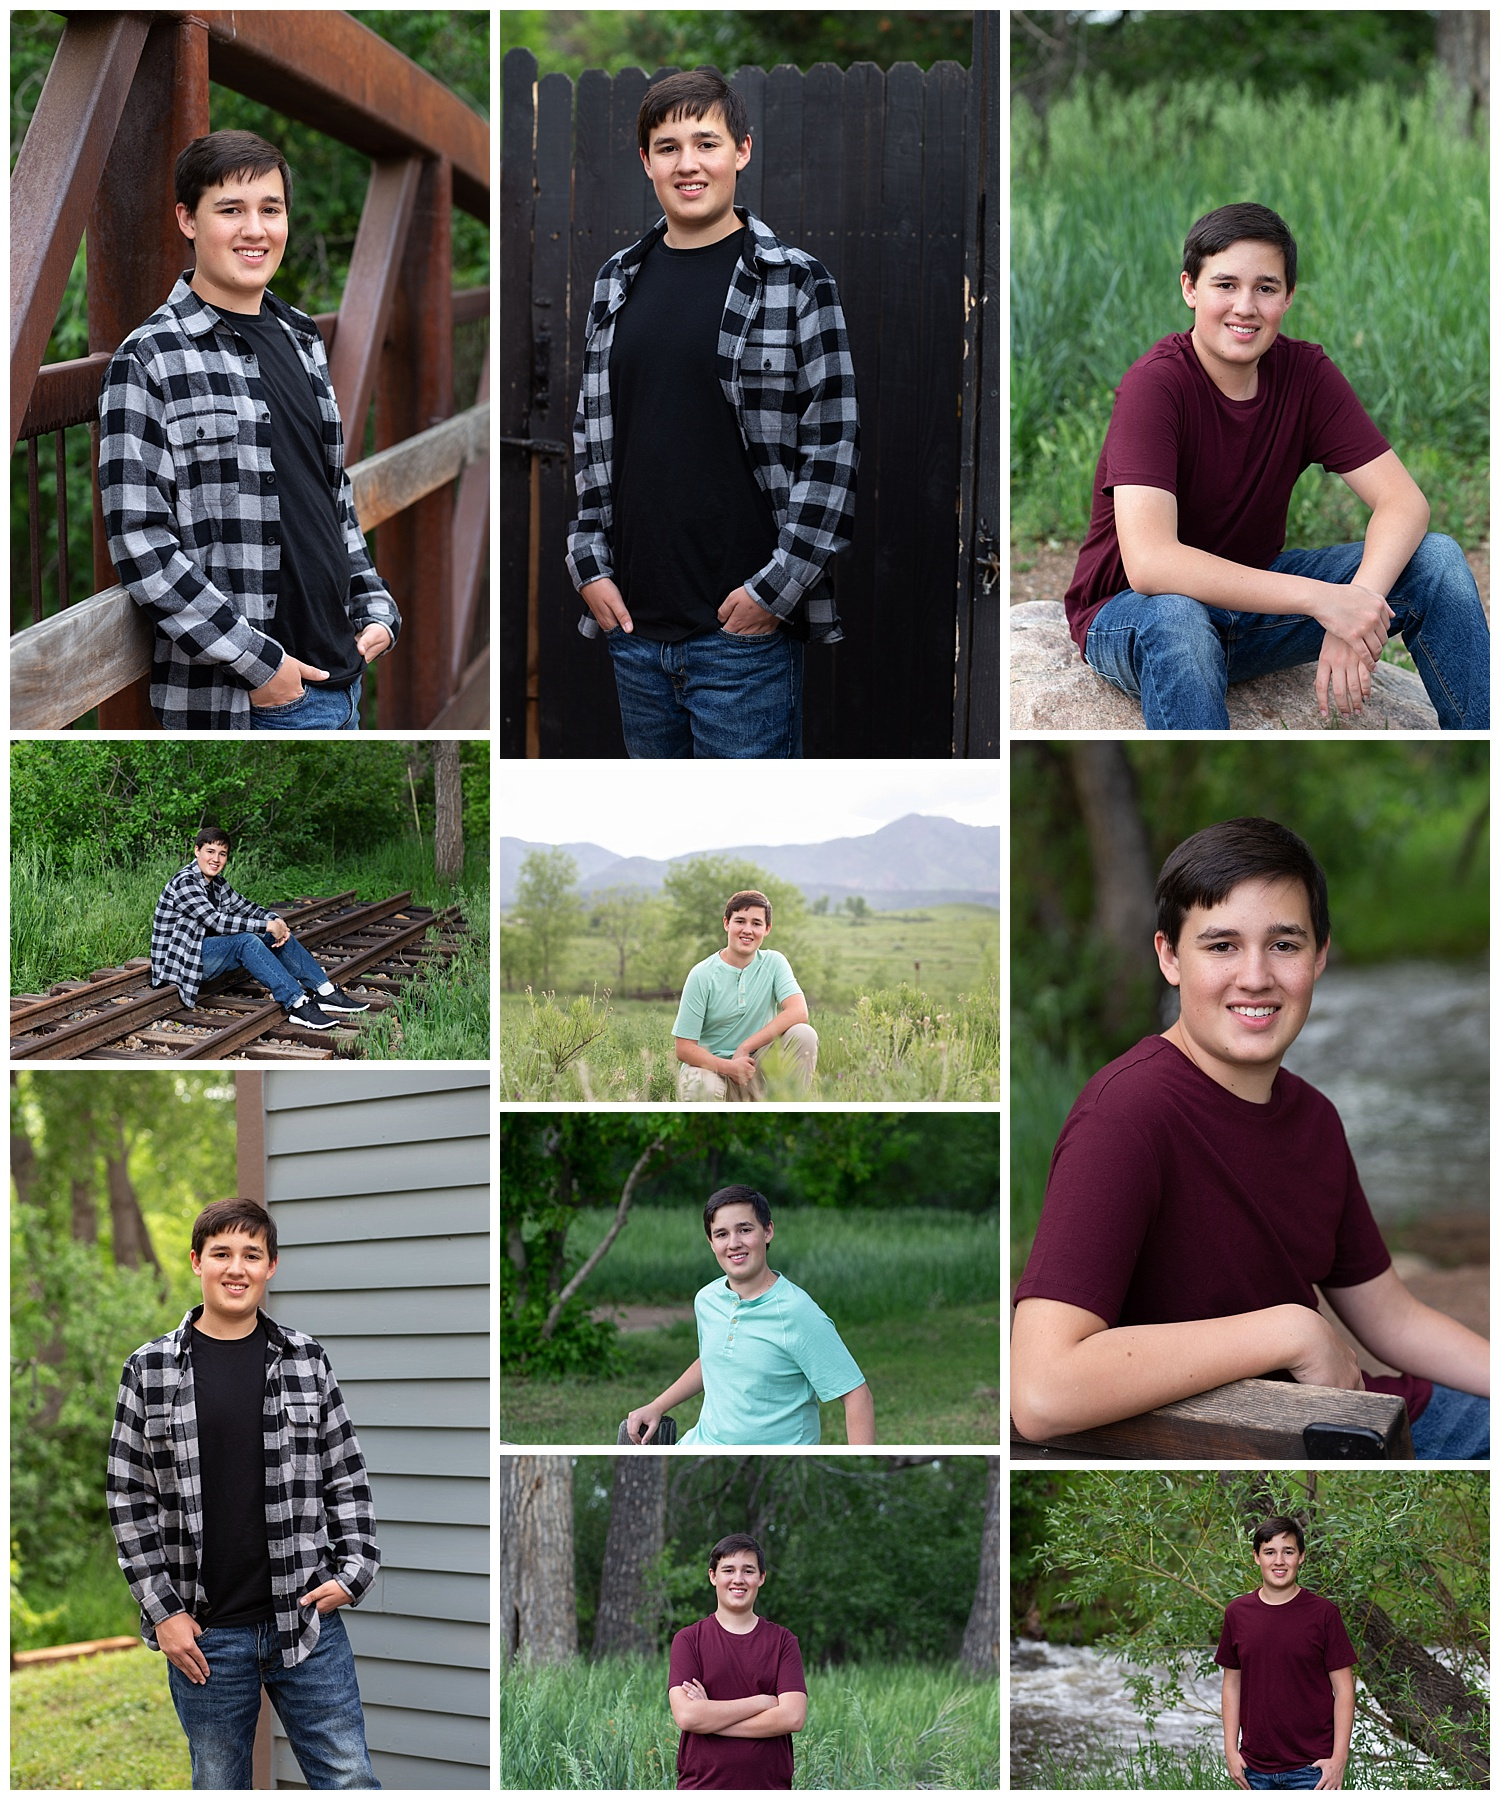 Reid's high school senior portraits were taken on June 7, 2019.